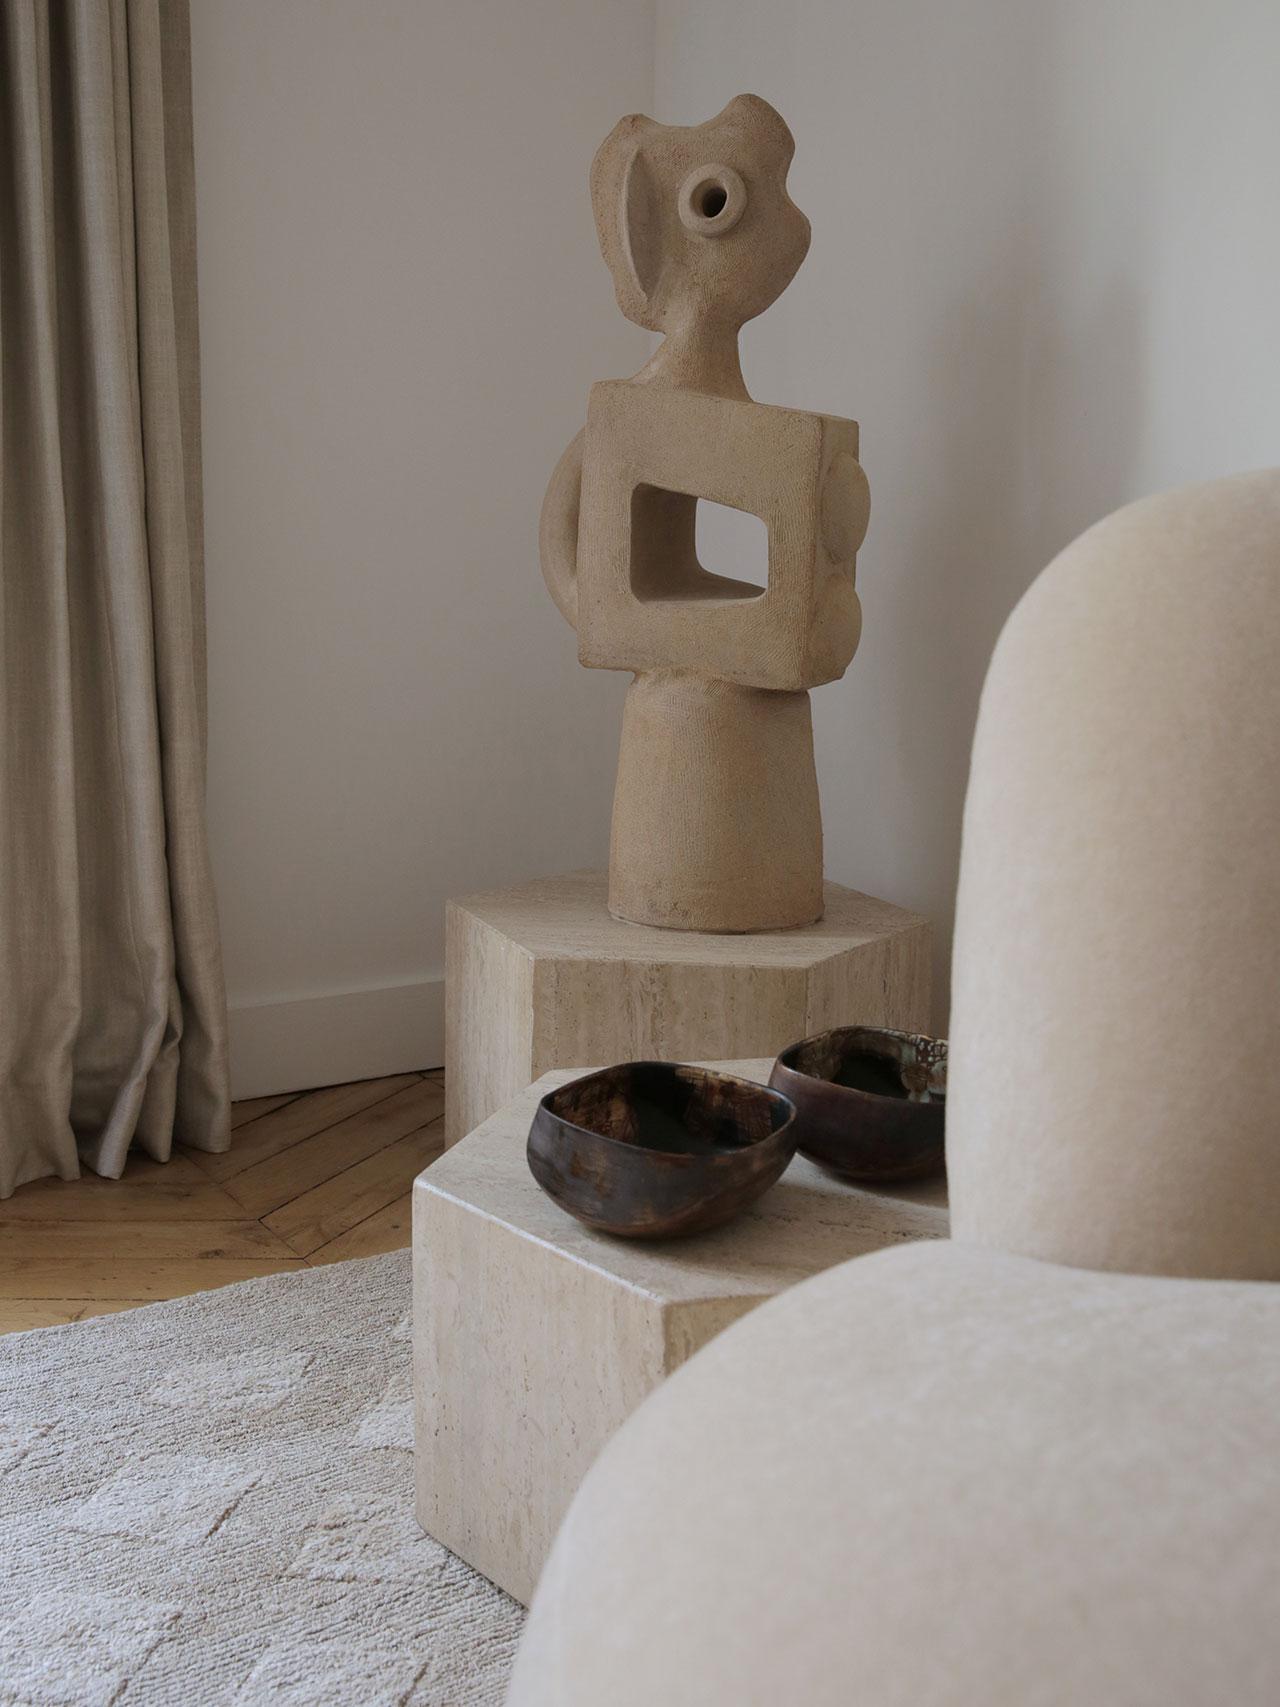 Monumental sculpture in stoneware by Michel Lanos (1926 - 2005), 1990-2000. Setof 3 hexagonal side tablesin travertin by unknown designer, circa 1970-1980. Pair of bowlsin ceramic by Eugène Fidler, 1970. Photography by Damien de Medeiros.